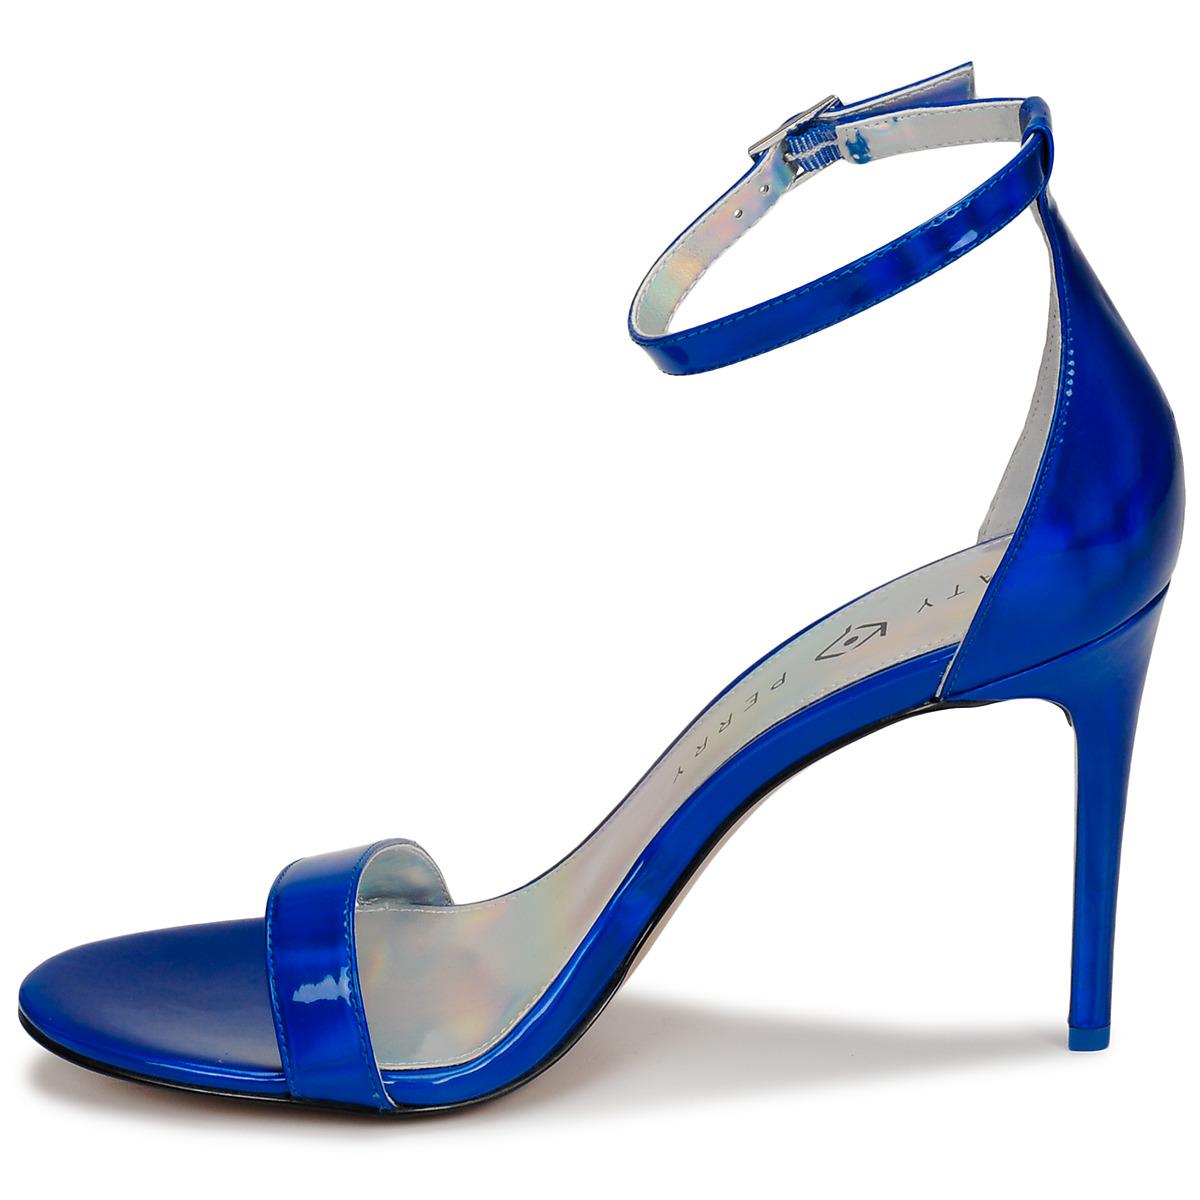 Katy Perry THE JAMIE Blu 15558127 Consegna Gratuita OutletScarpeOnline.it